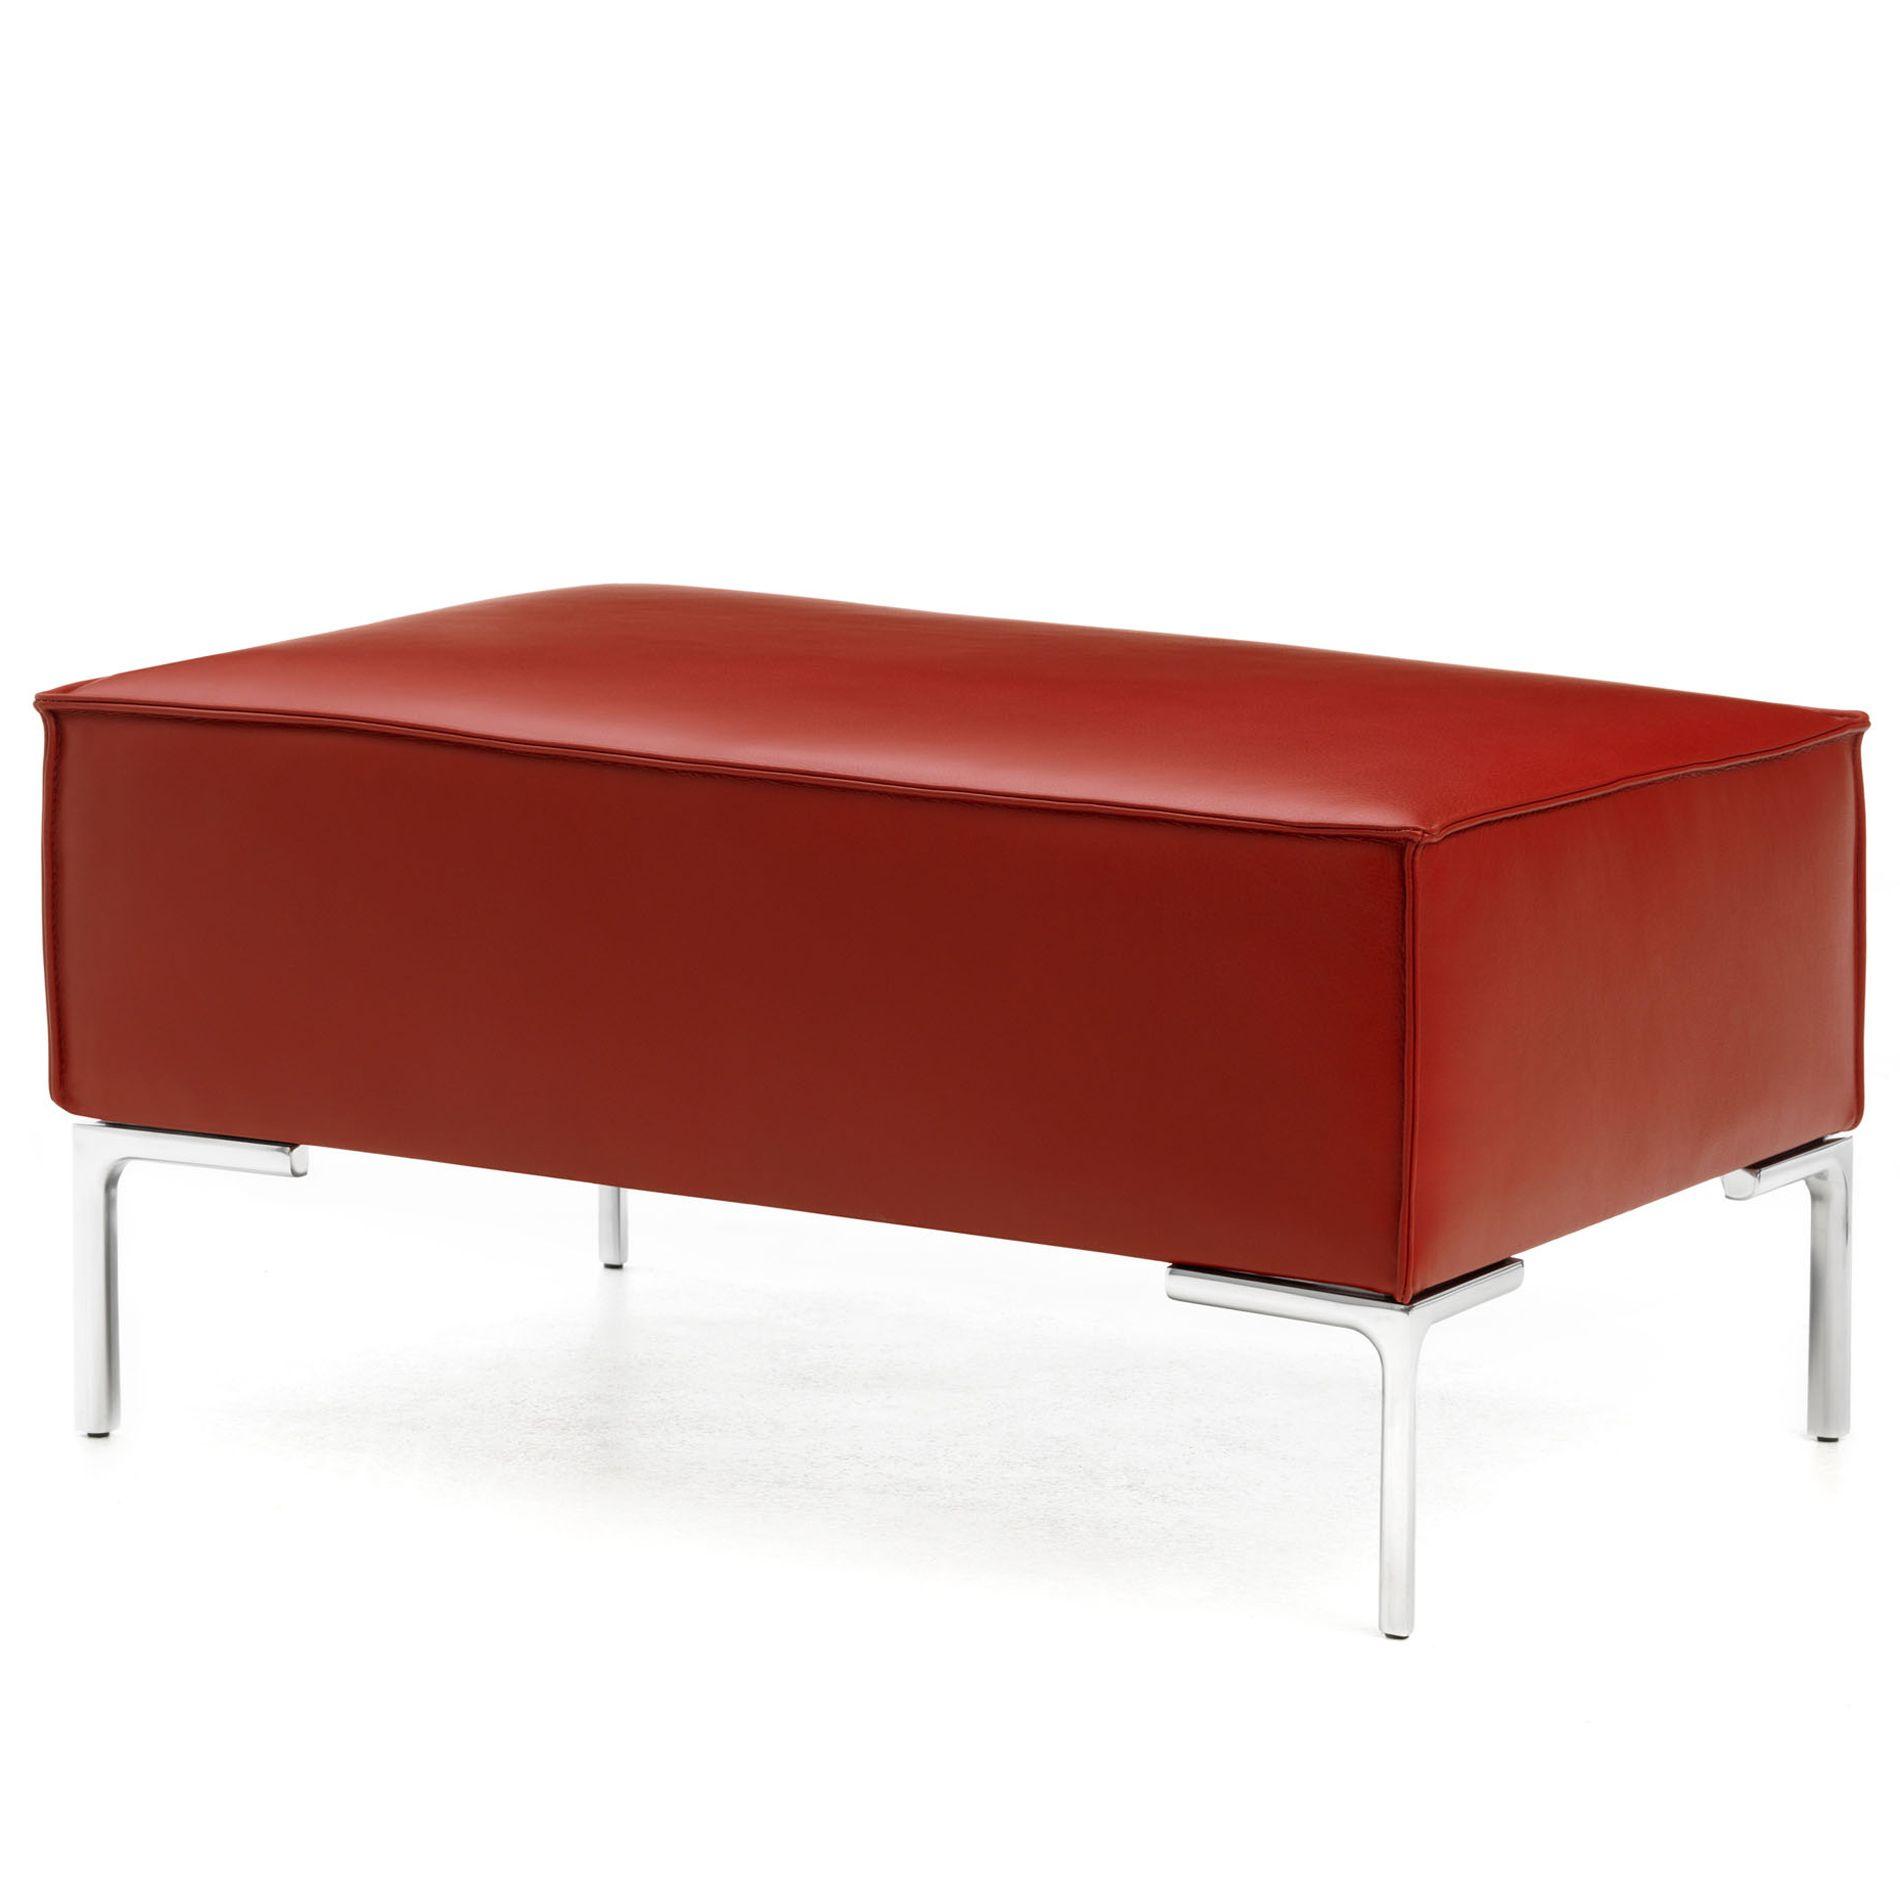 80x58cm Stock Design Bloq On Poef WQrdCBxoeE